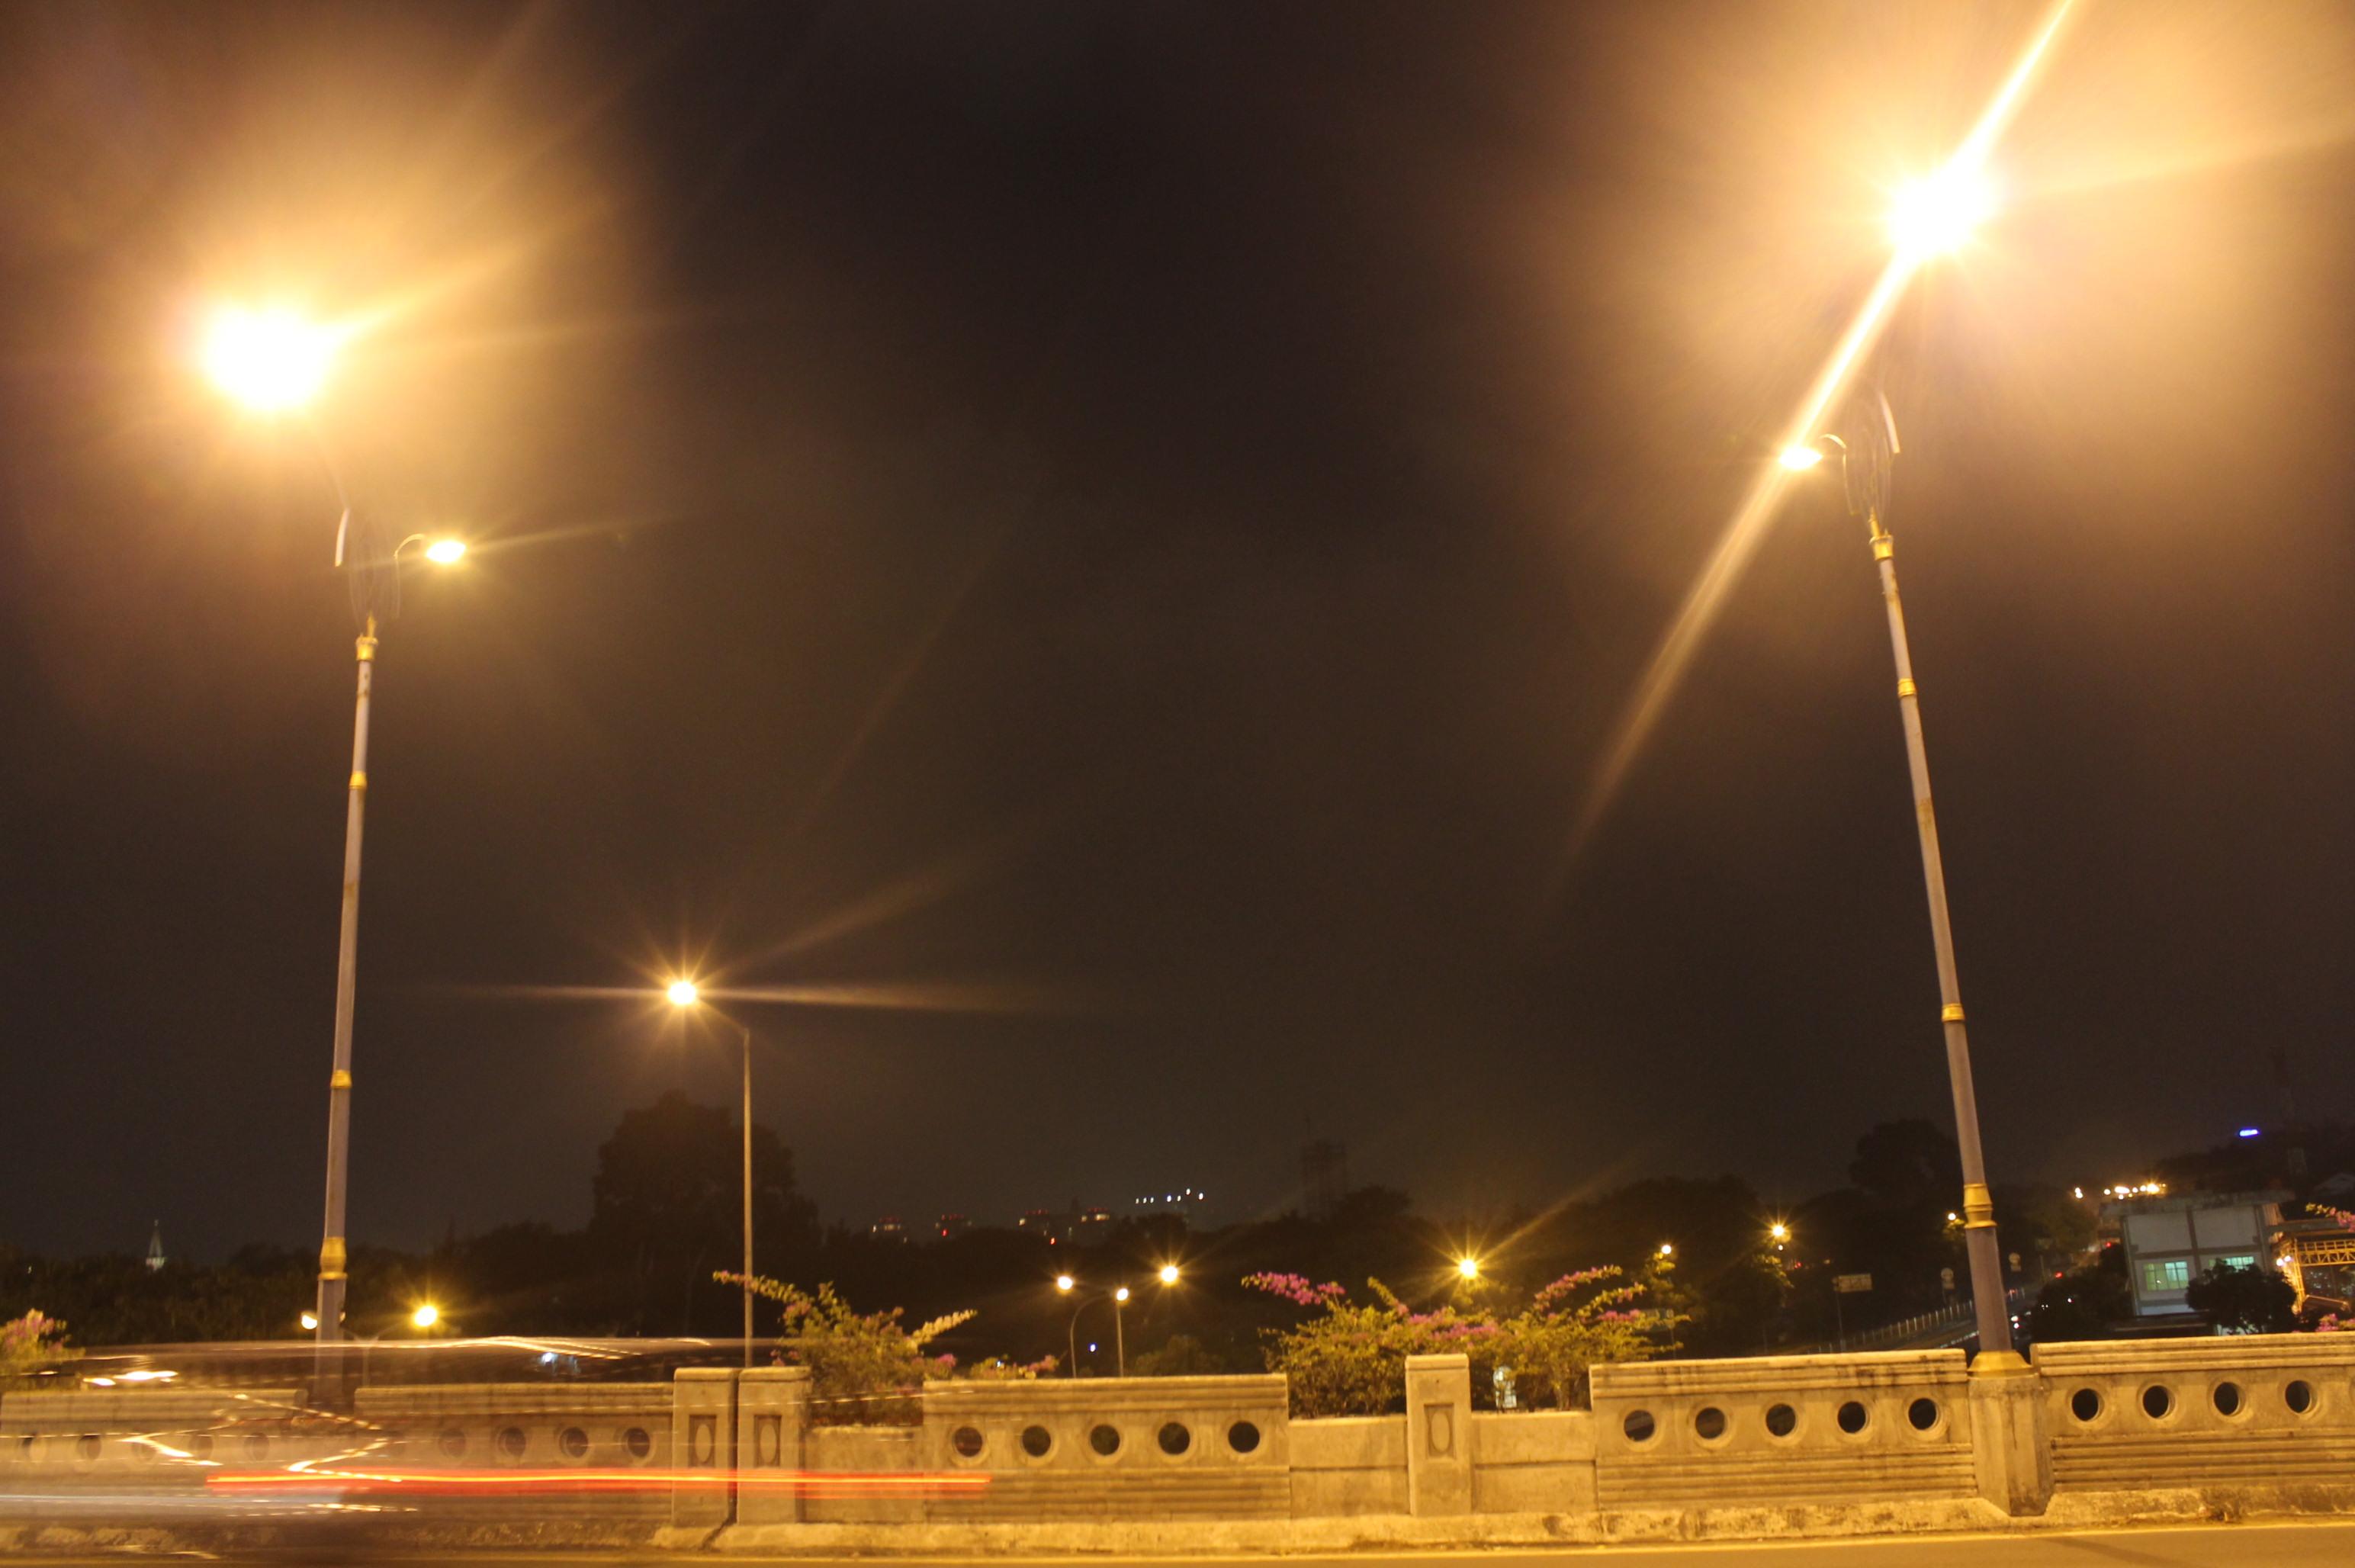 lampu penerangan by ranggabozz